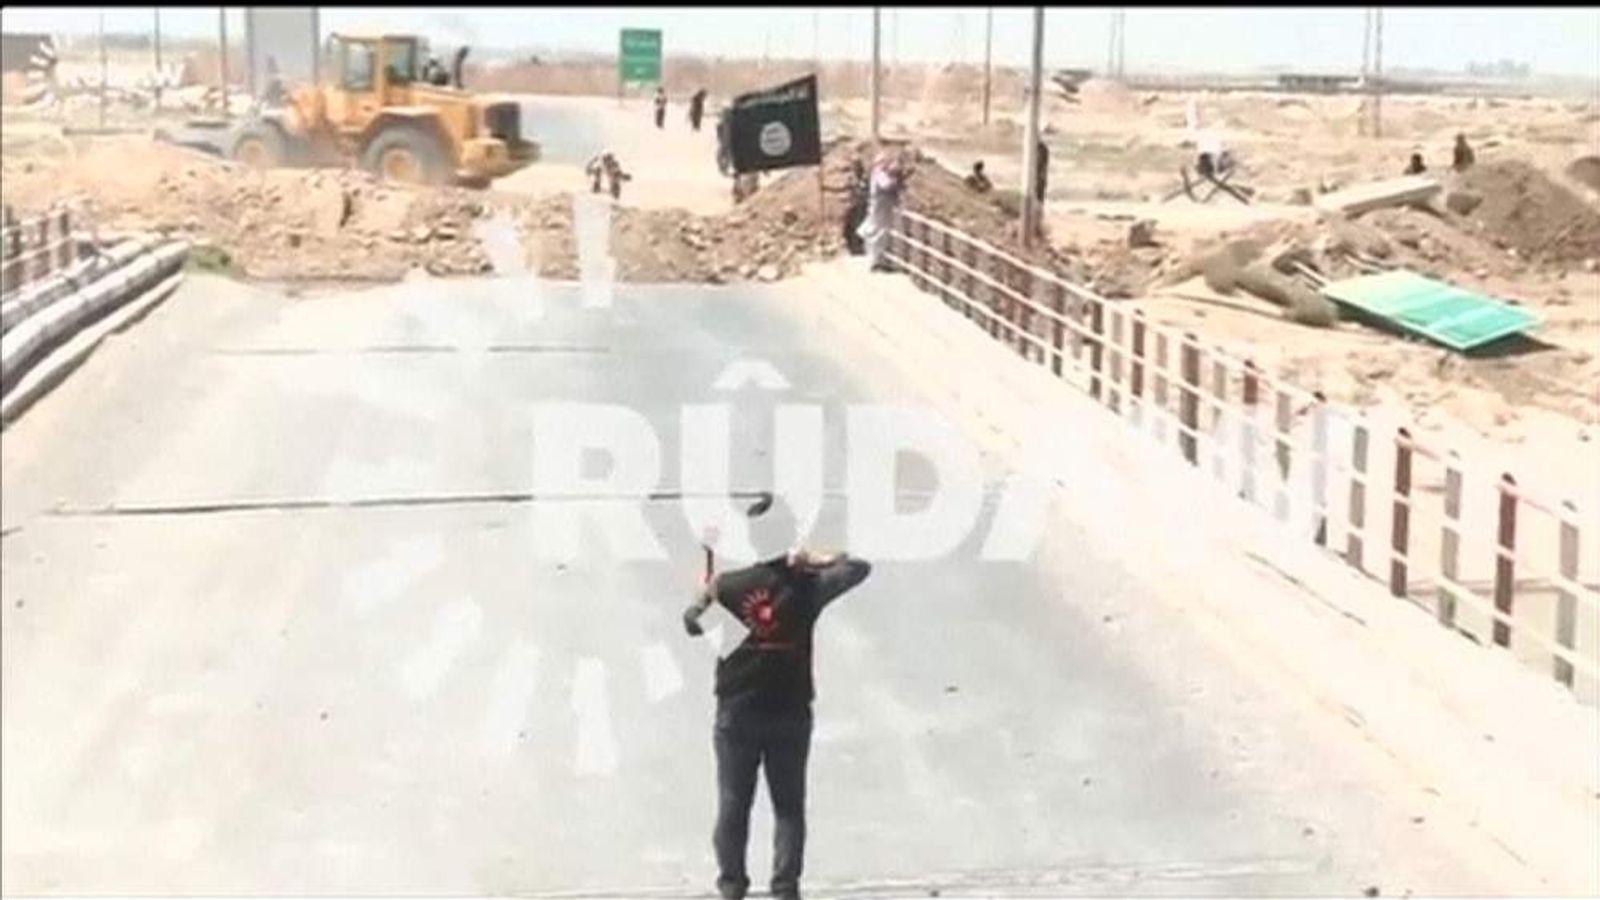 Rudaw reporter confronts ISIS militants on bridge near Kirkuk